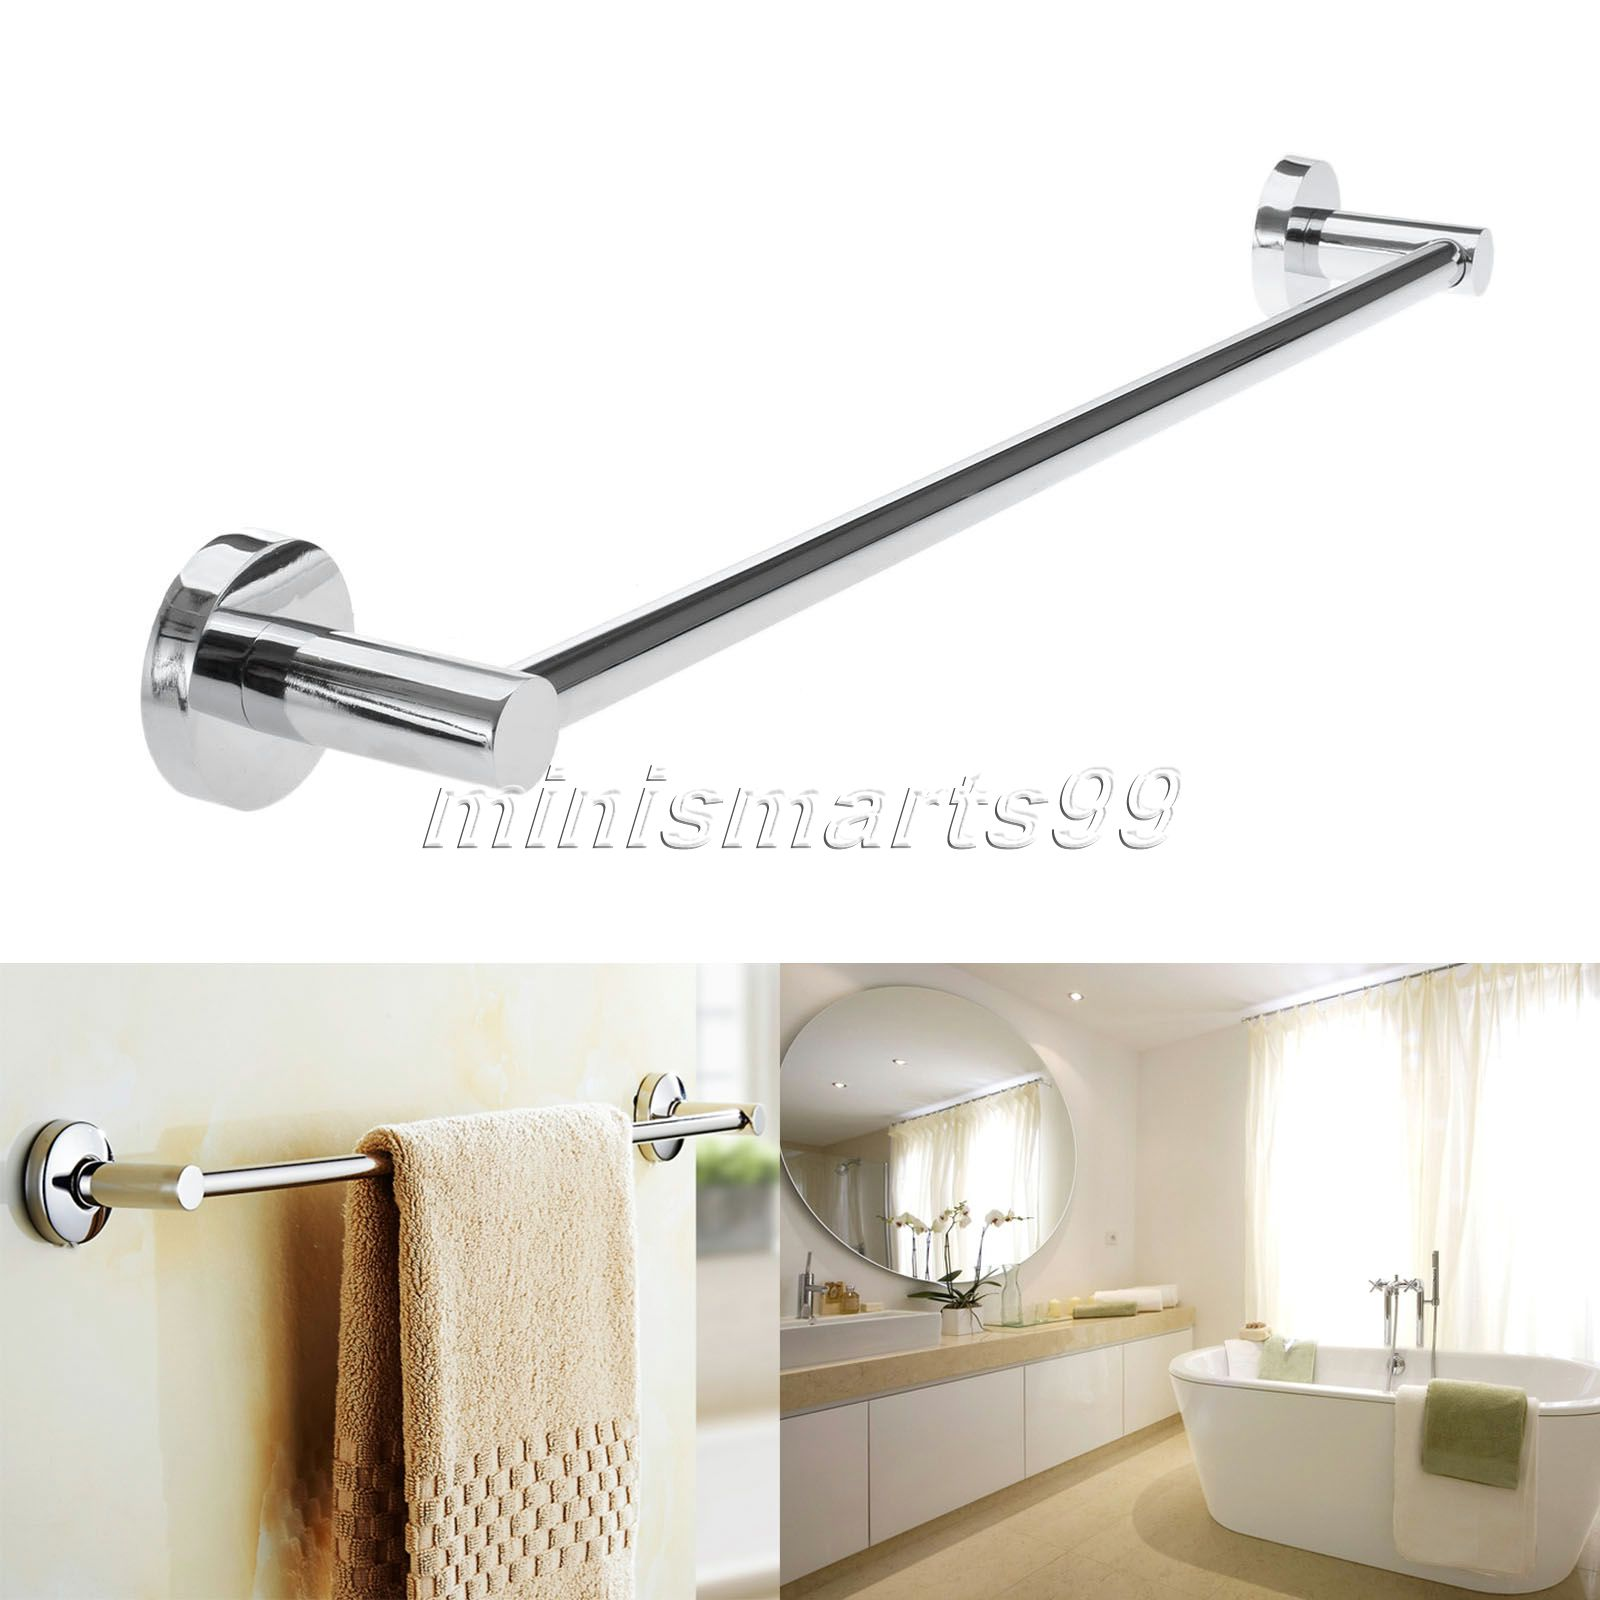 Towel holders for bathrooms wall - 60cm Steel Towel Rack Holder Wall Mounted Bathroom Towel Holders Single Pole Towel Bars Bath